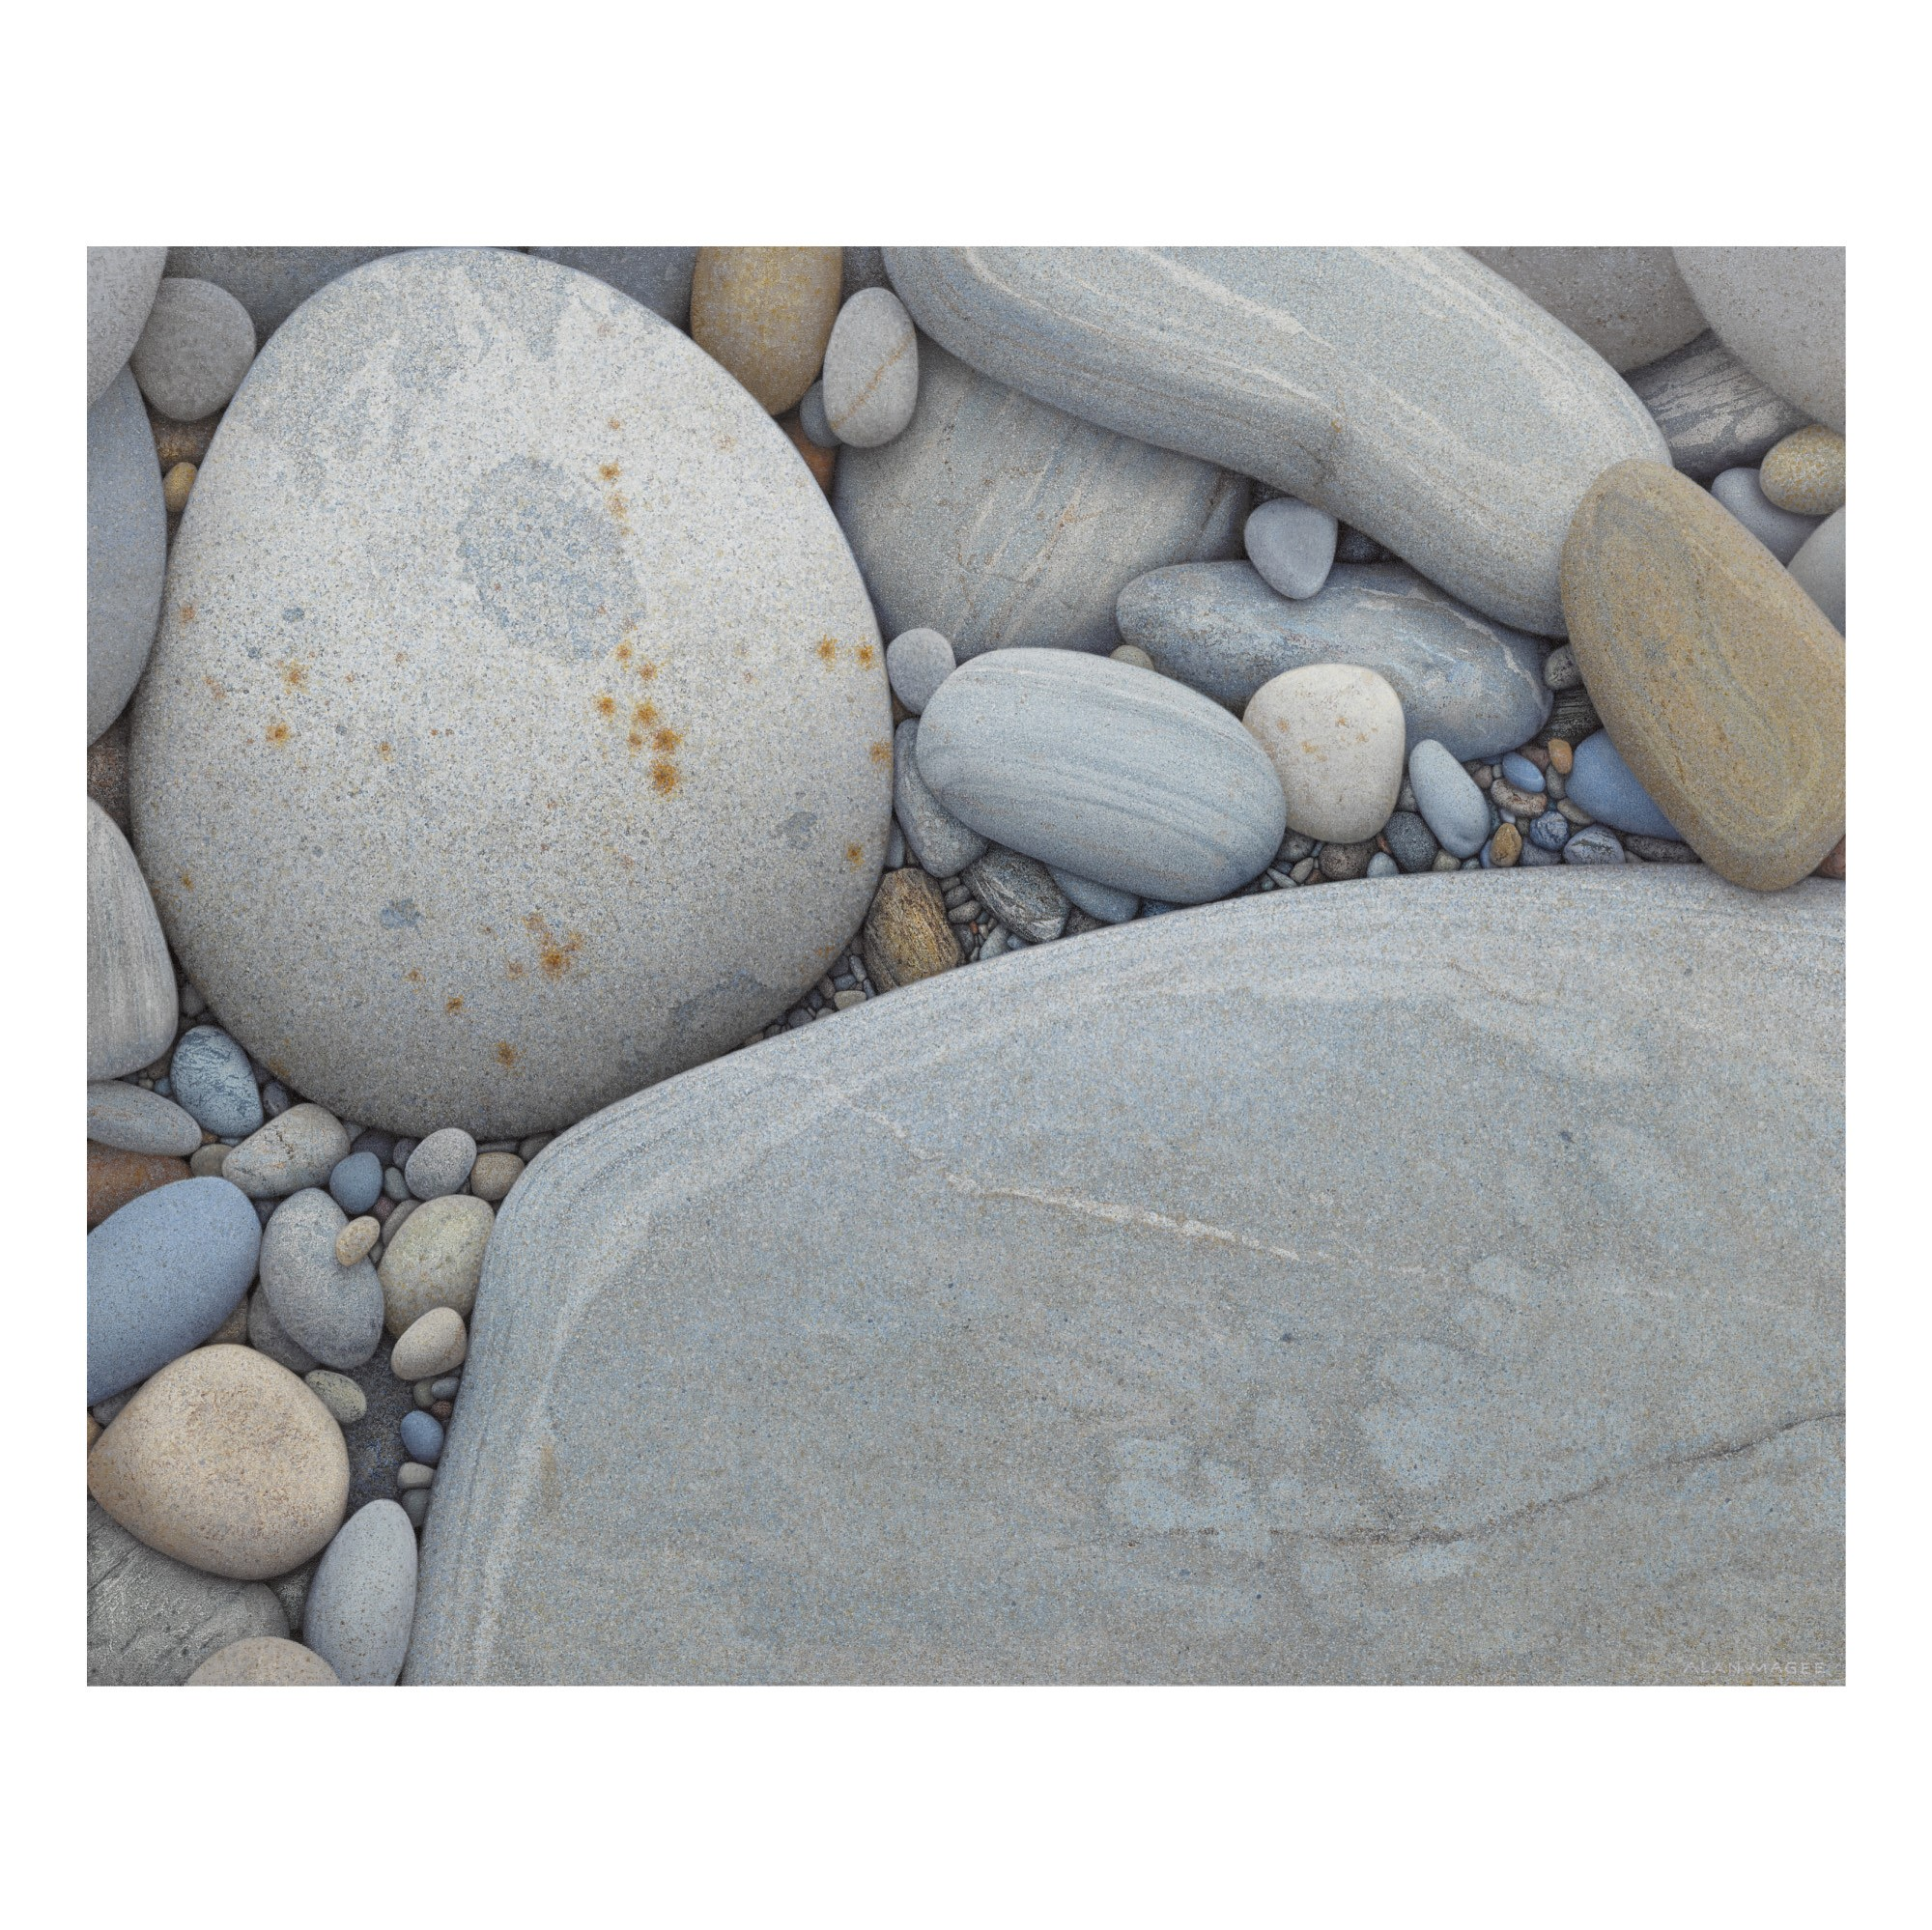 ALAN ARTHUR MAGEE | BEACH STONES